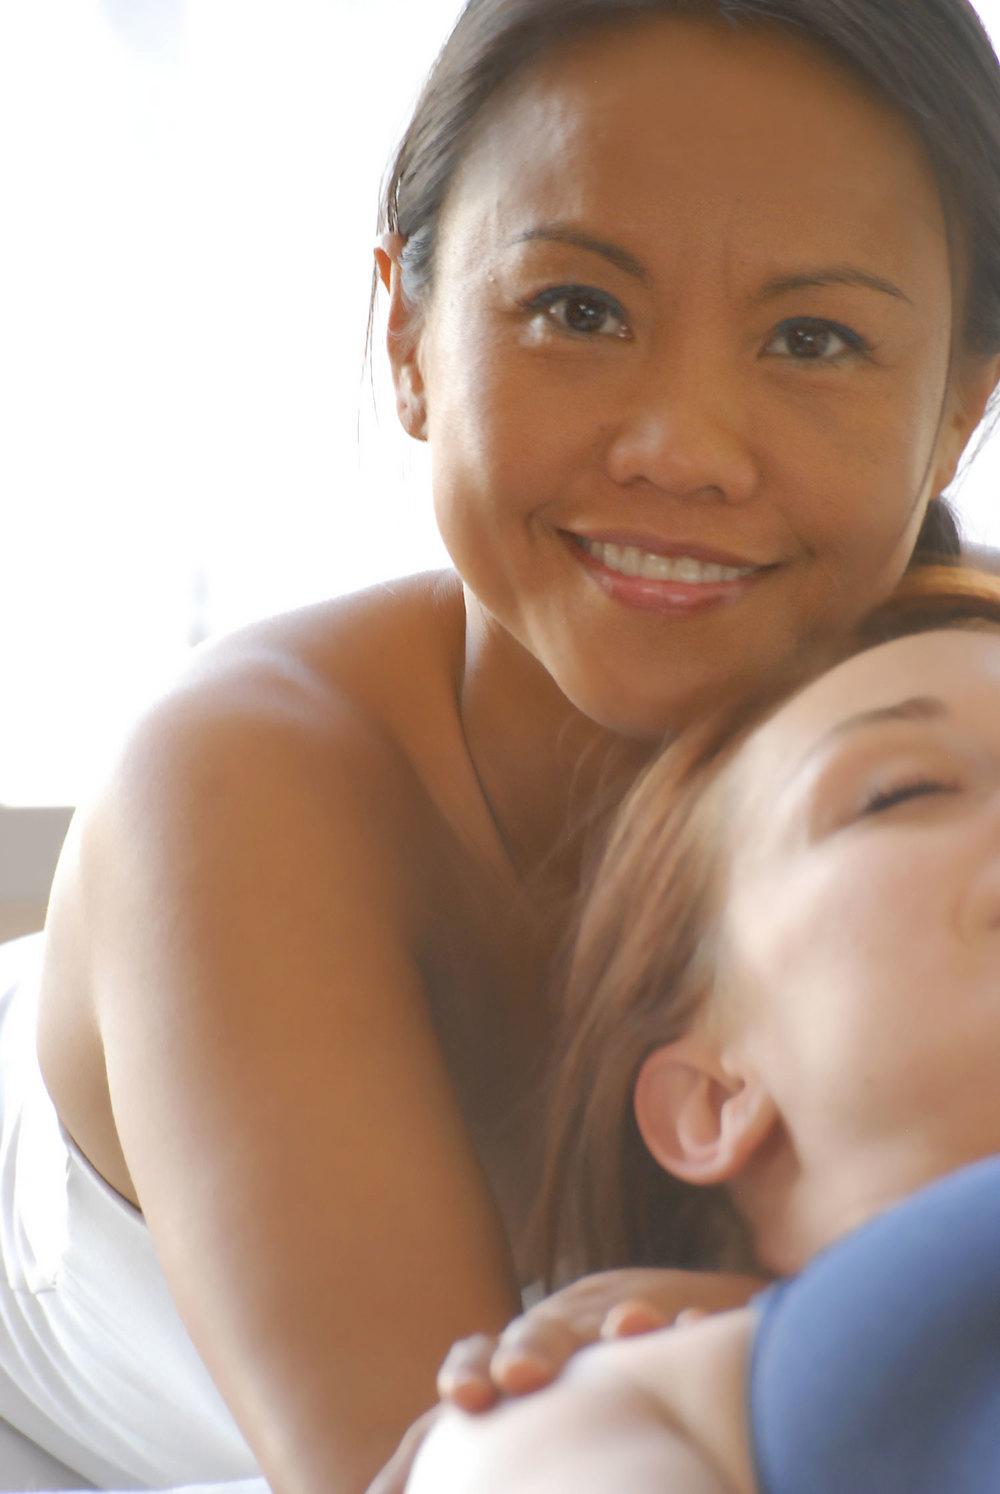 Abby-Smile-Neck-Massage.web.jpg